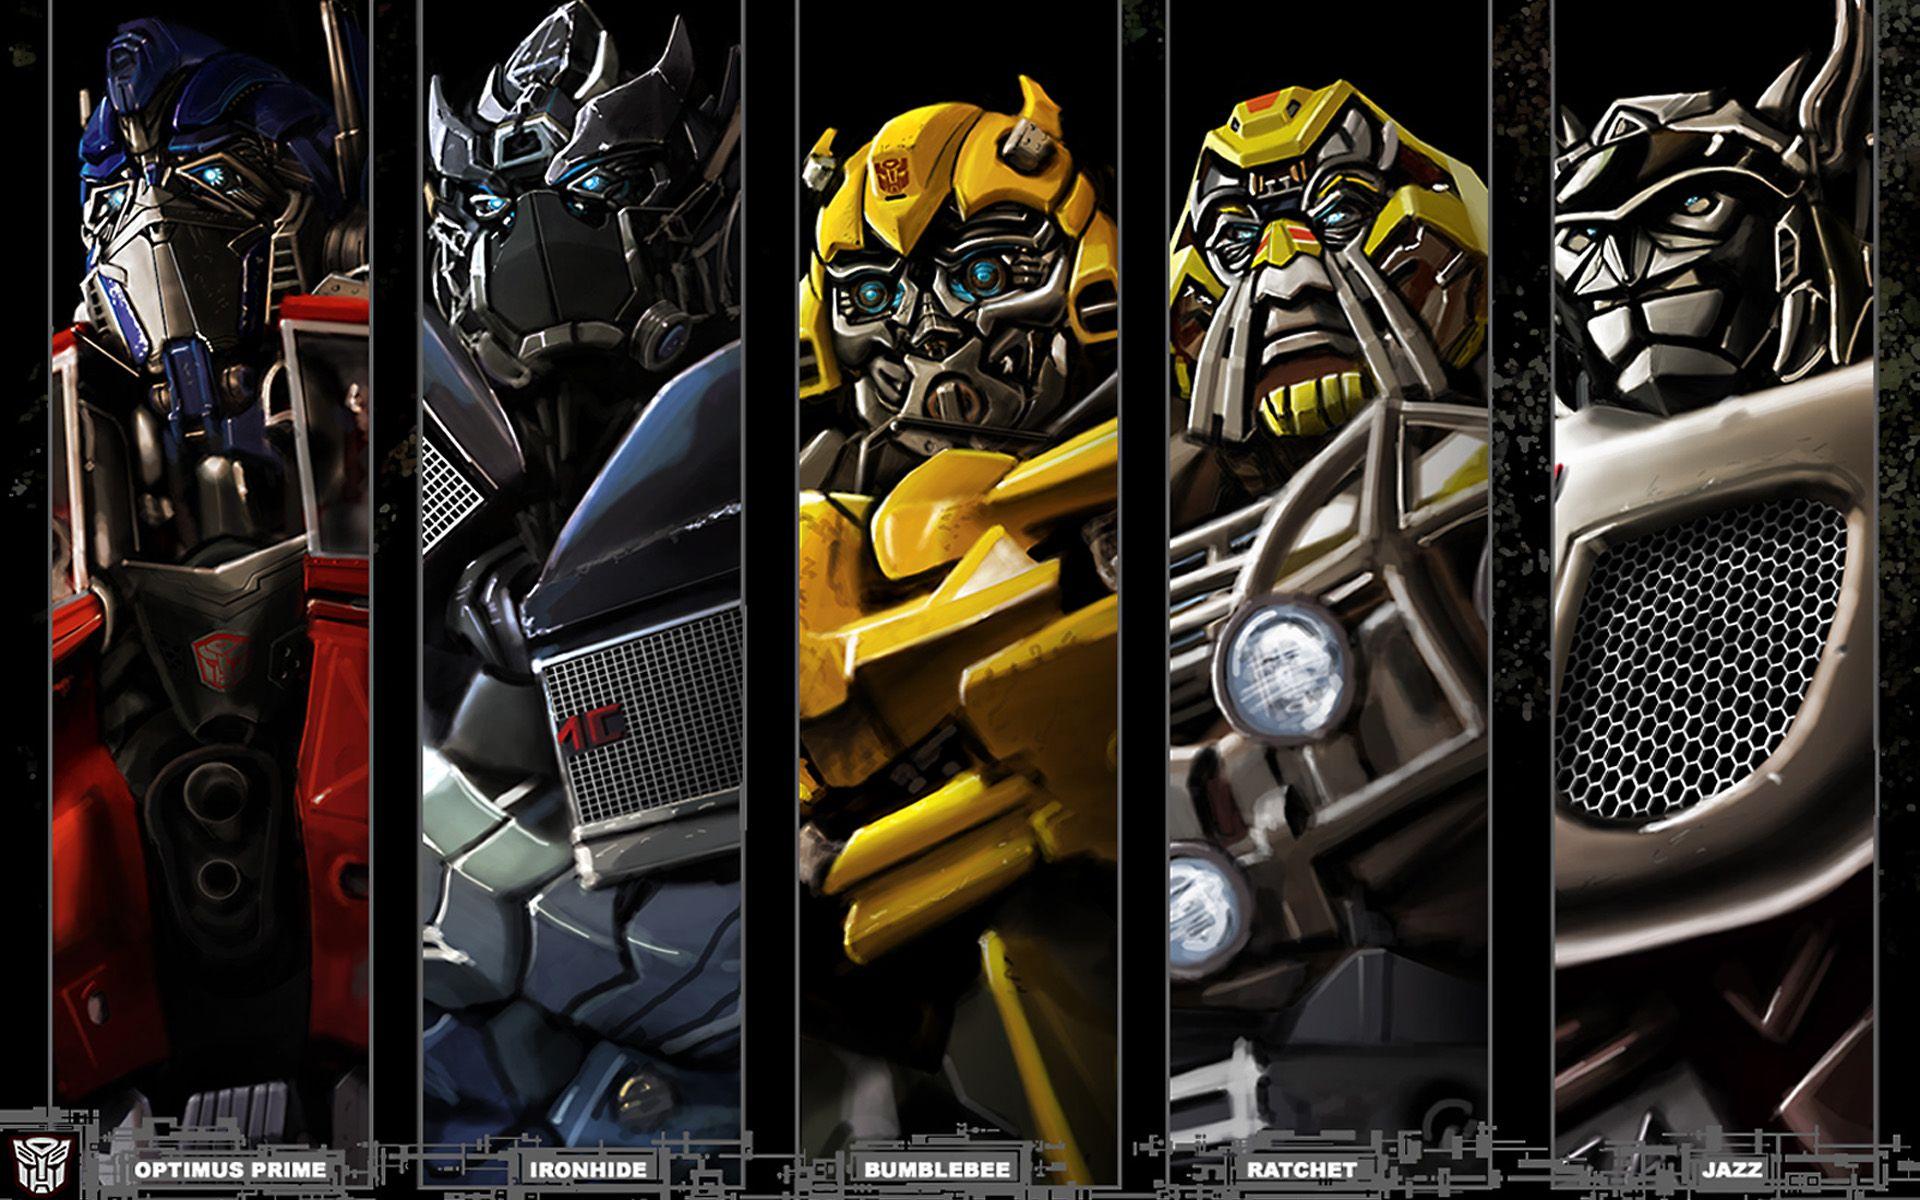 Transformers Autobots Wallpaper Transformers Poster Transformers Autobots Transformers Movie